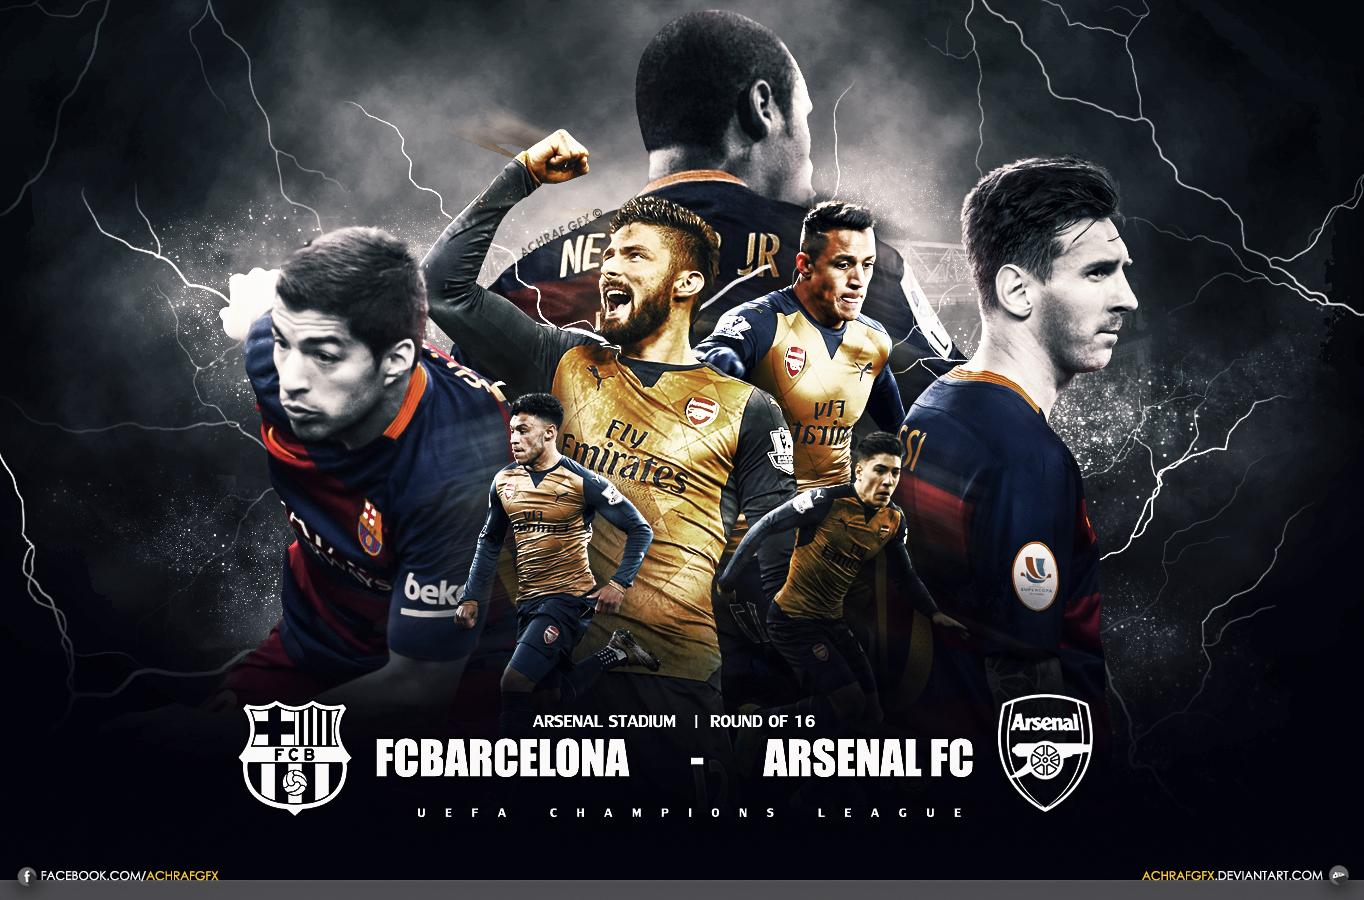 FCBARCELONA vs ARSENAL FC by Achrafgfx on DeviantArt